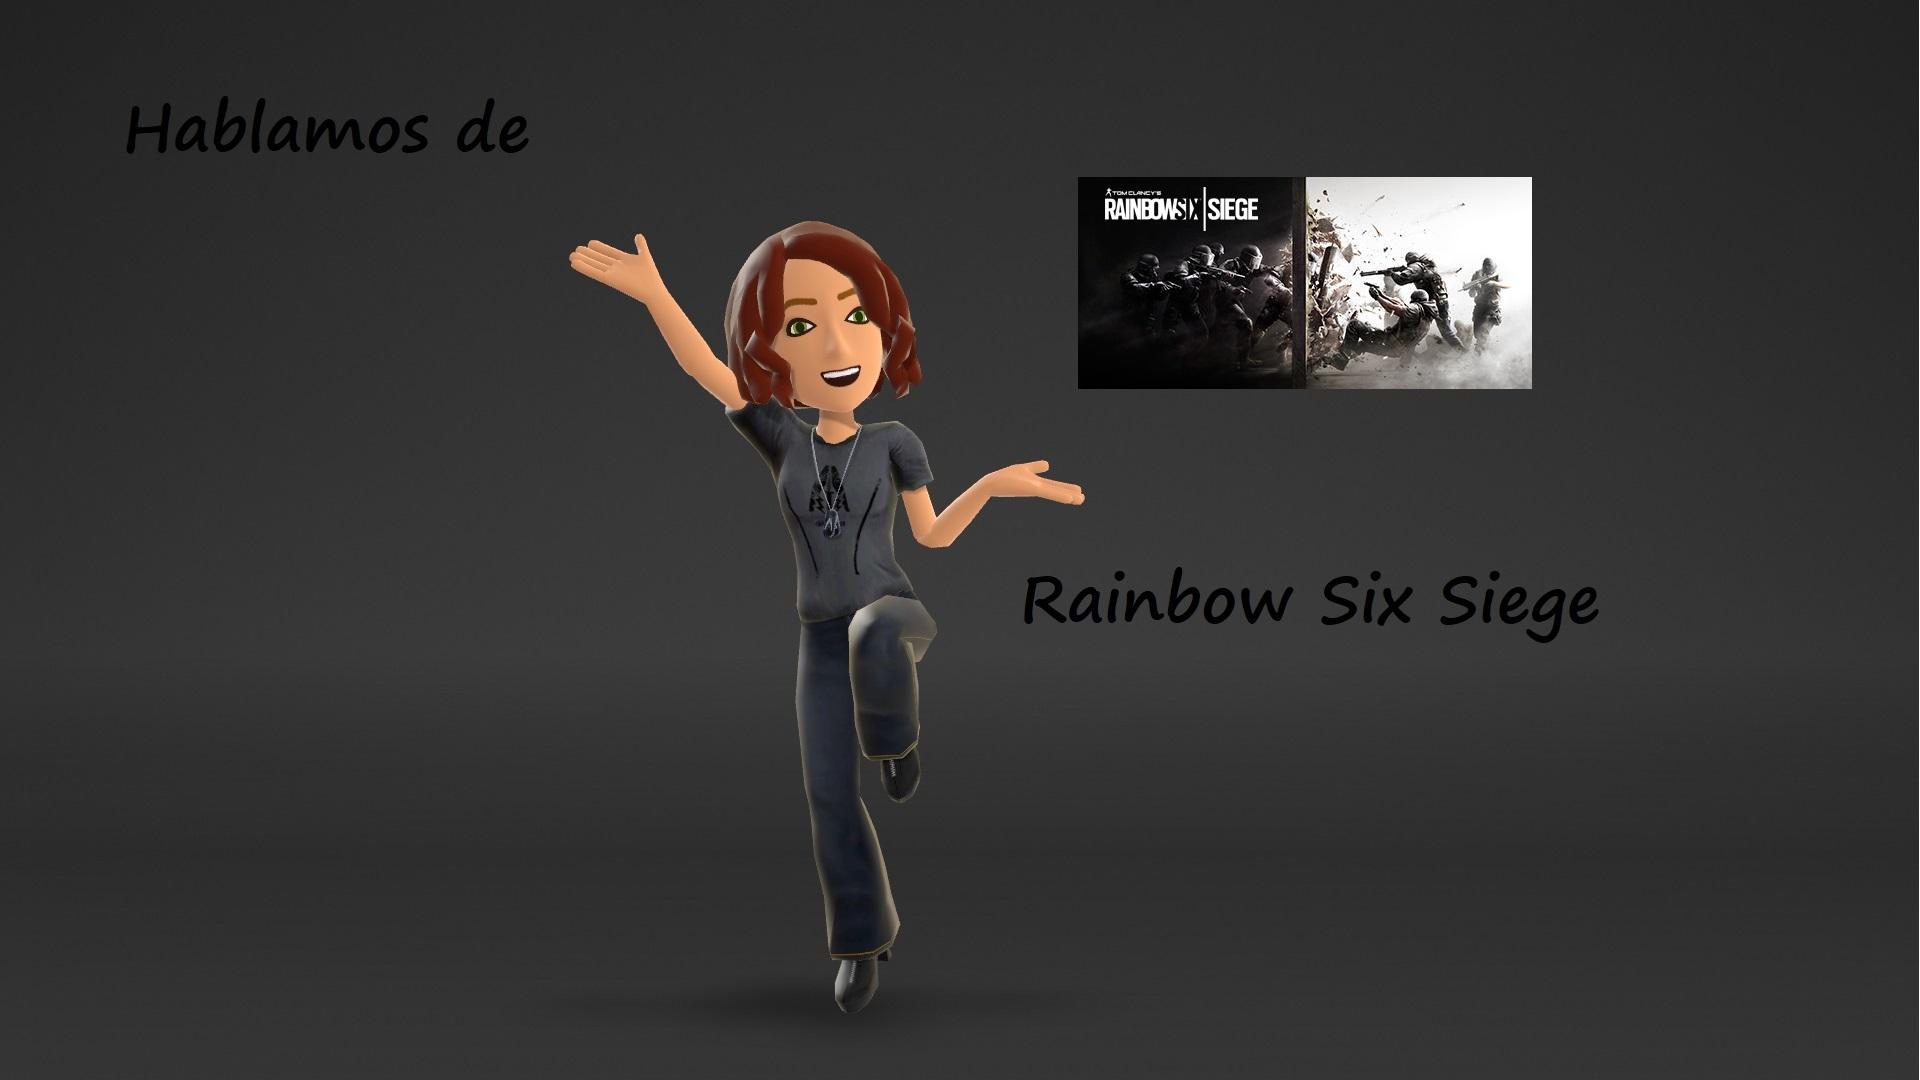 Hablamos sobre Rainbow Six: Siege